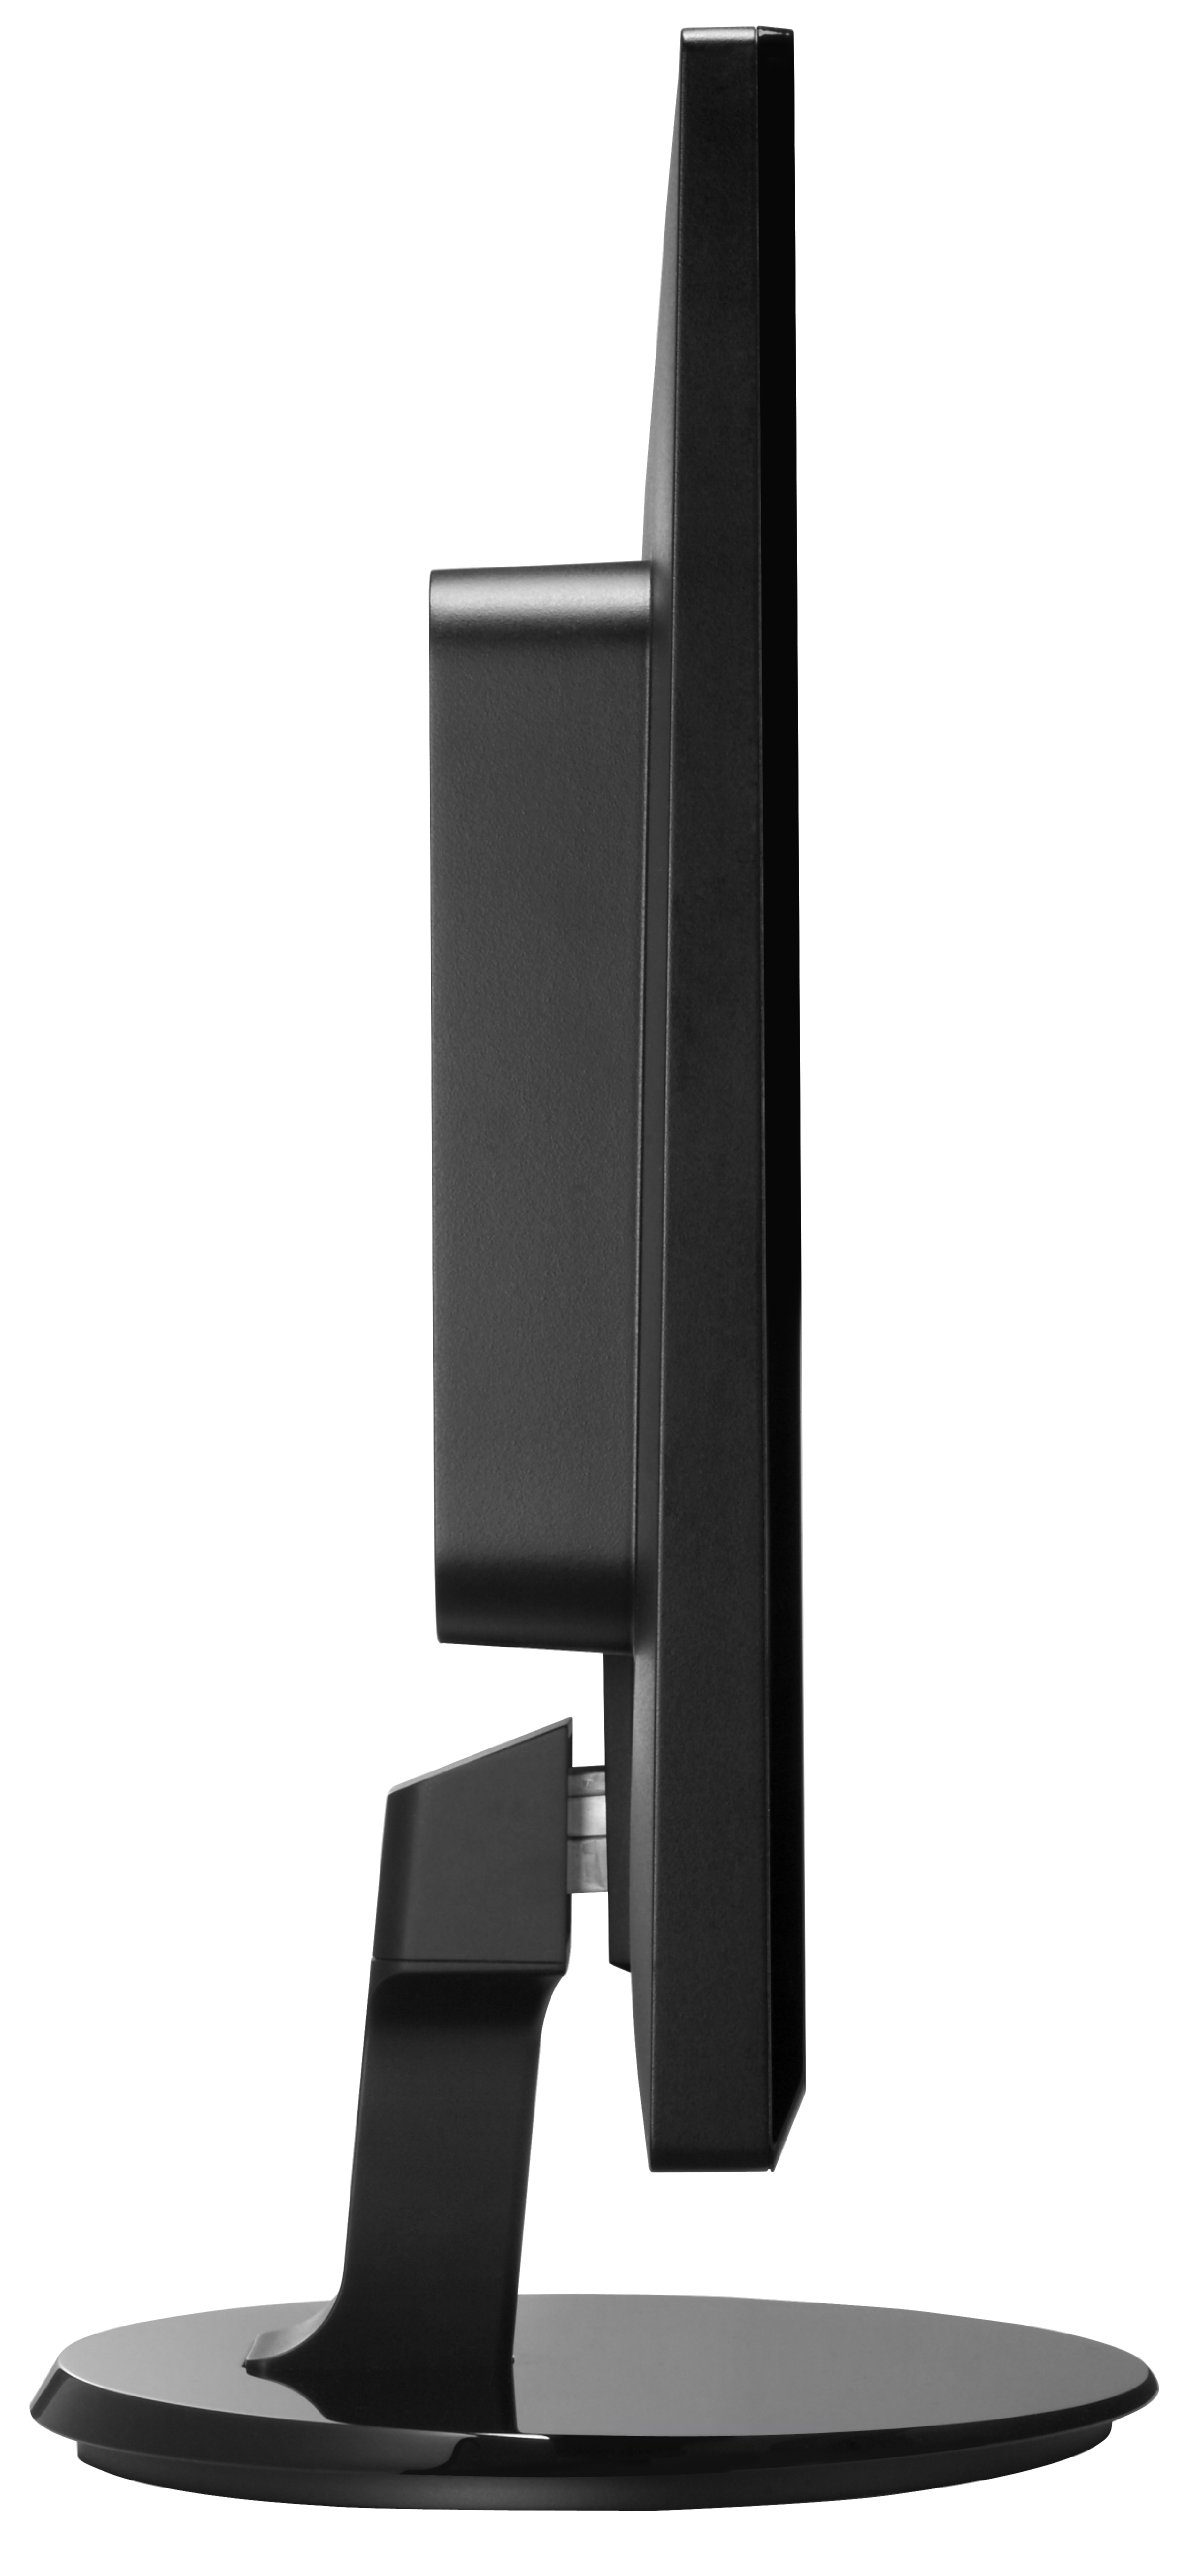 "Philips 246V5LHAB 24"" LED Monitor, 1920X1080 Resolution, 250cd/m2 Brightness, VGA/HDMI, Stereo Speakers"